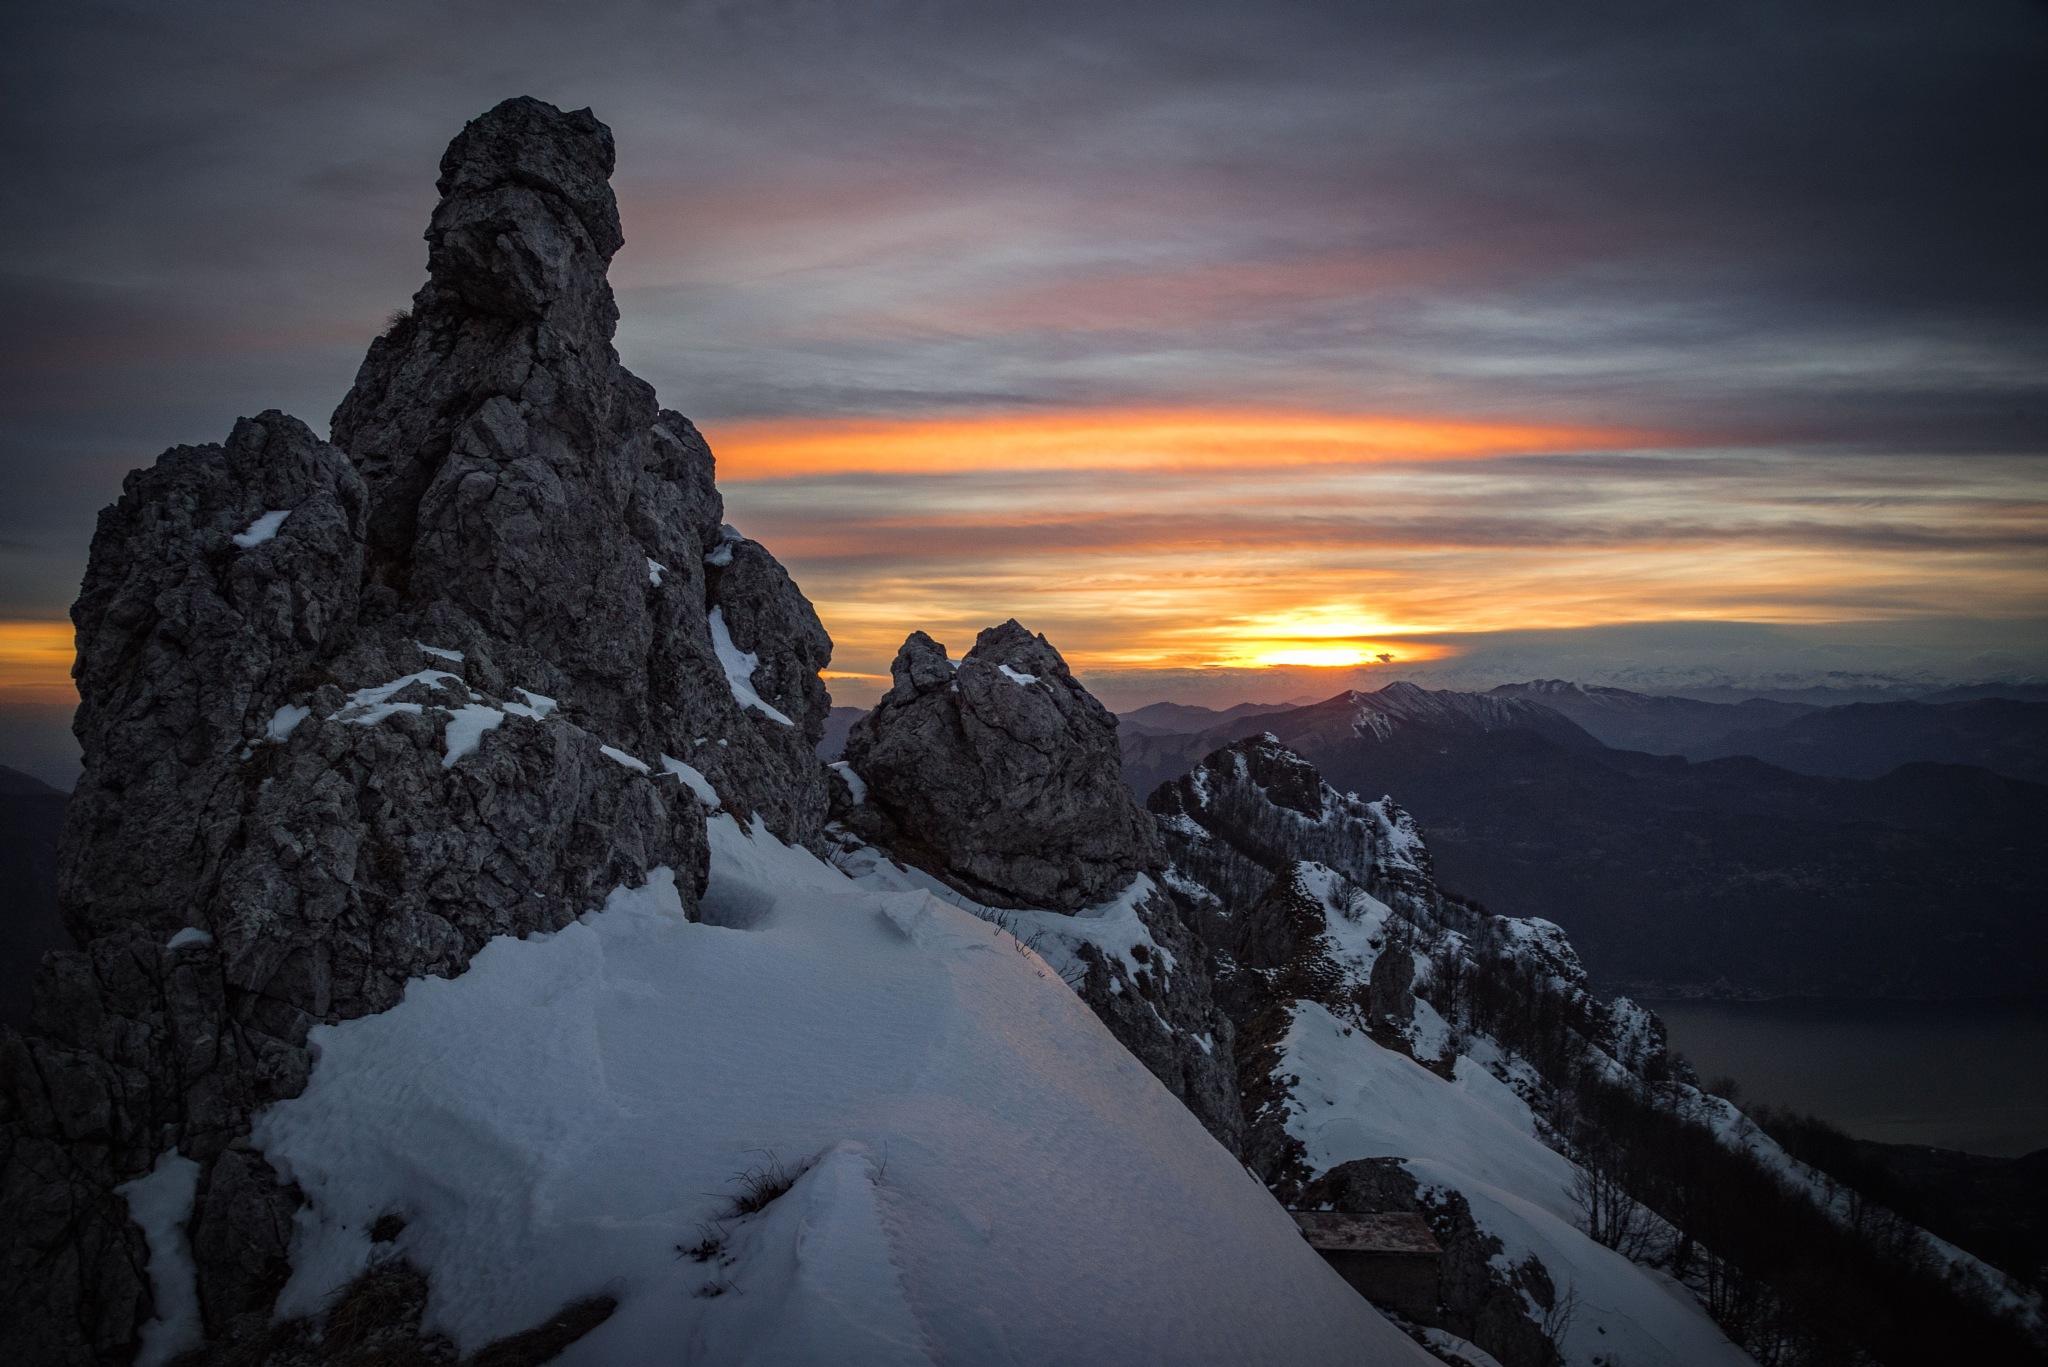 Le rocce delle Grigne by Valerio Seveso